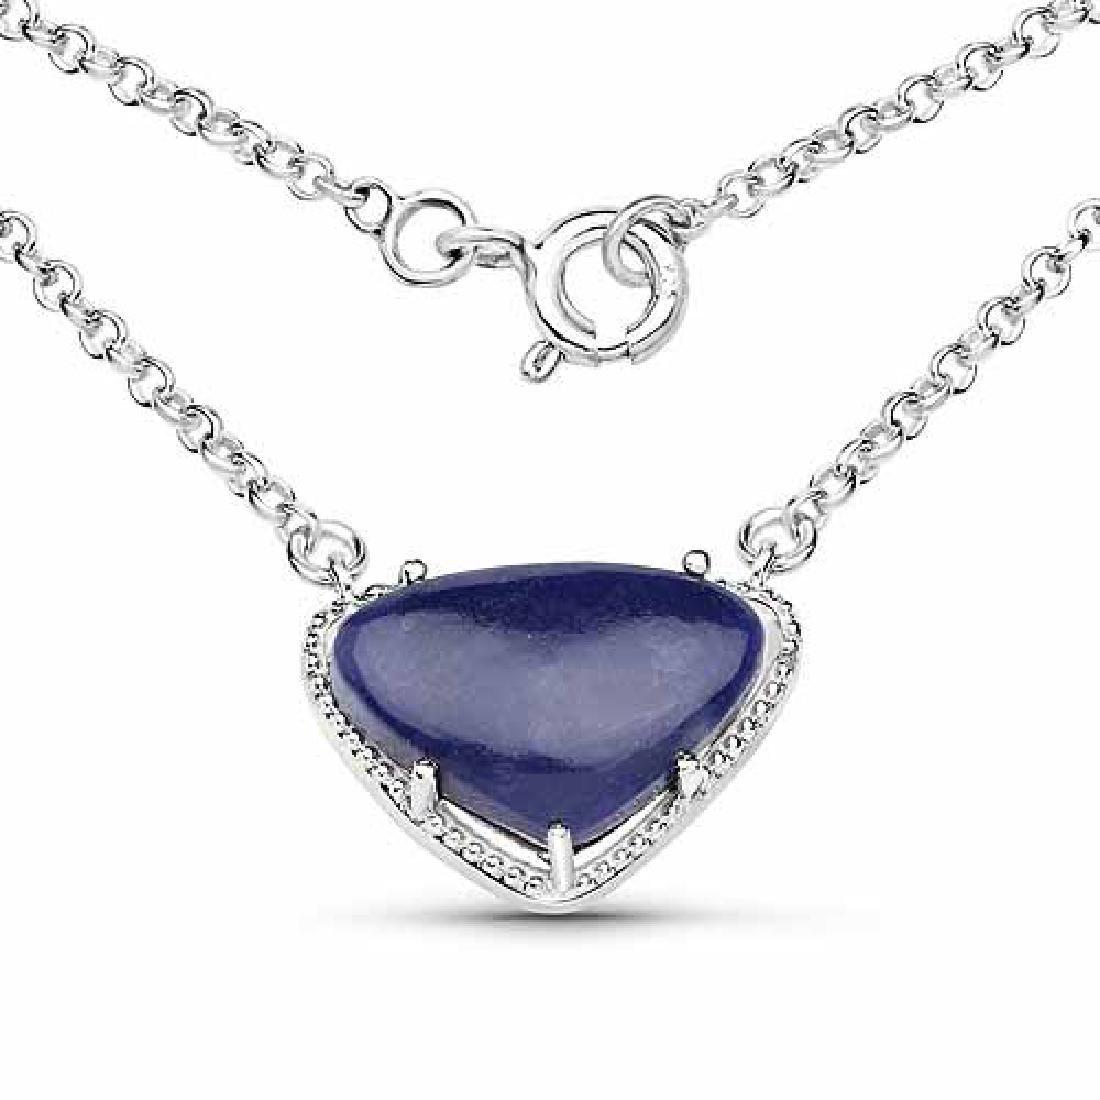 3.92 Carat Genuine Blue Aventurine .925 Sterling Silver